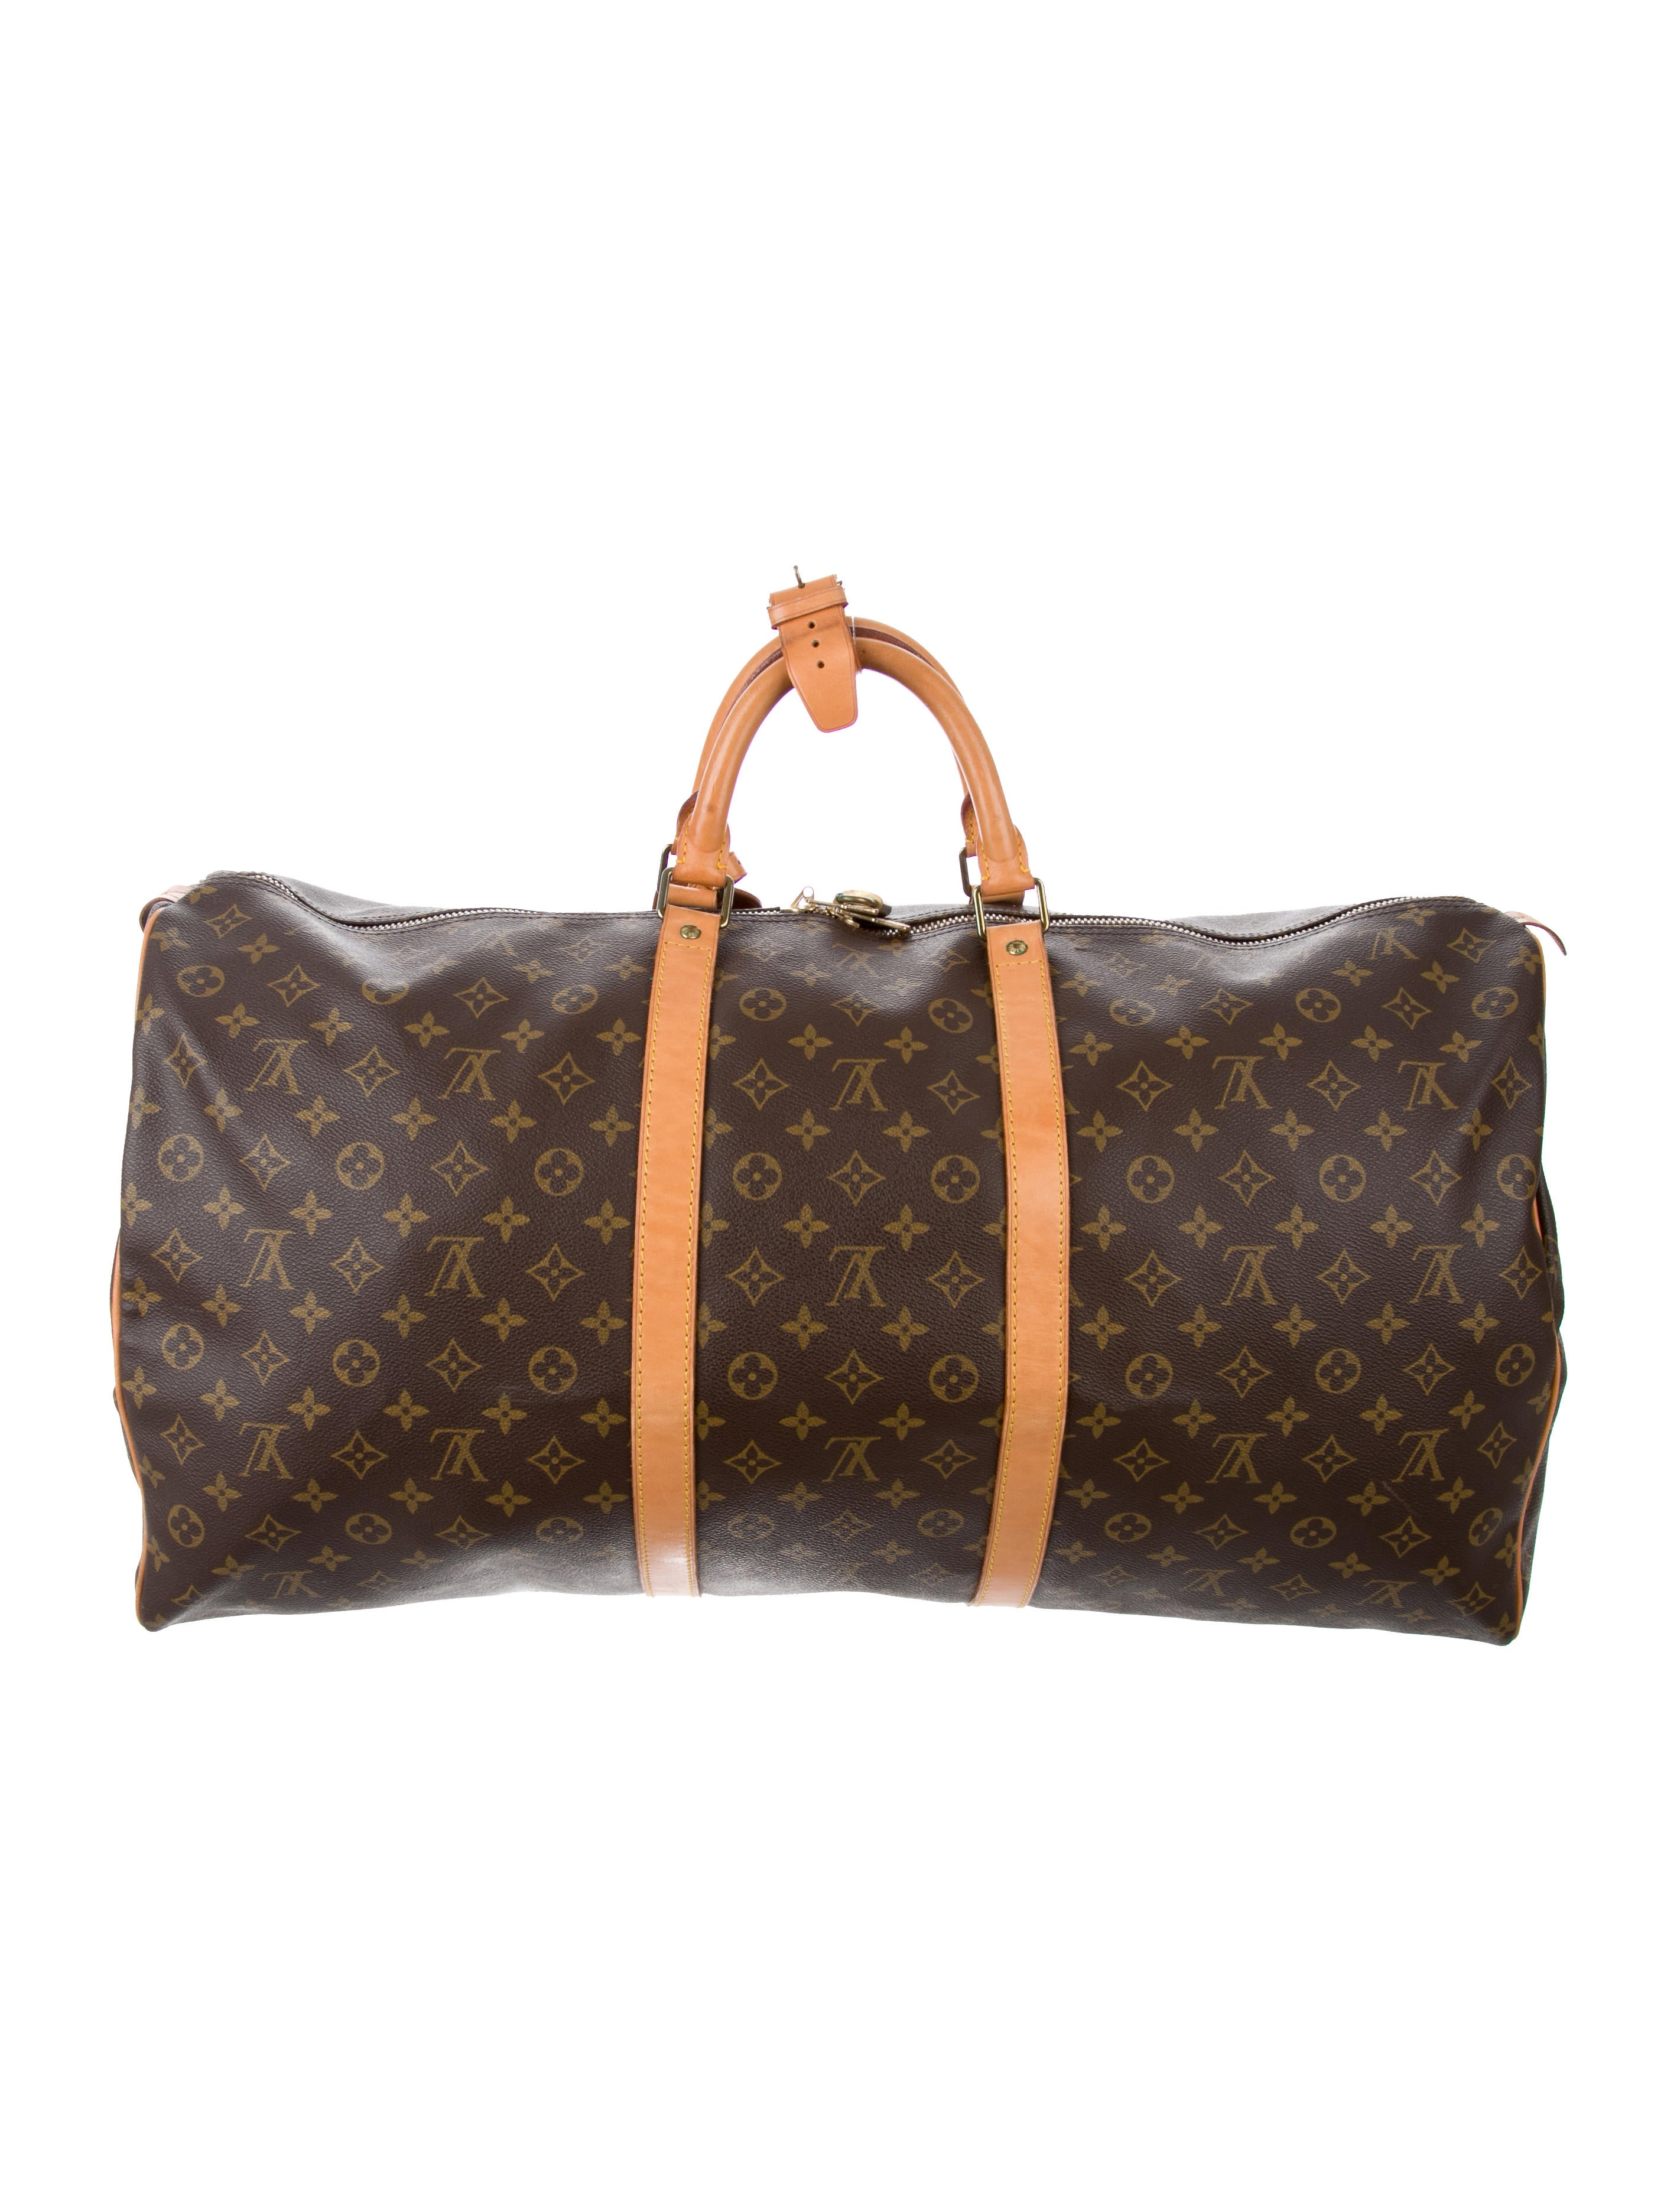 louis vuitton monogram keepall 60 bags lou122335 the realreal. Black Bedroom Furniture Sets. Home Design Ideas